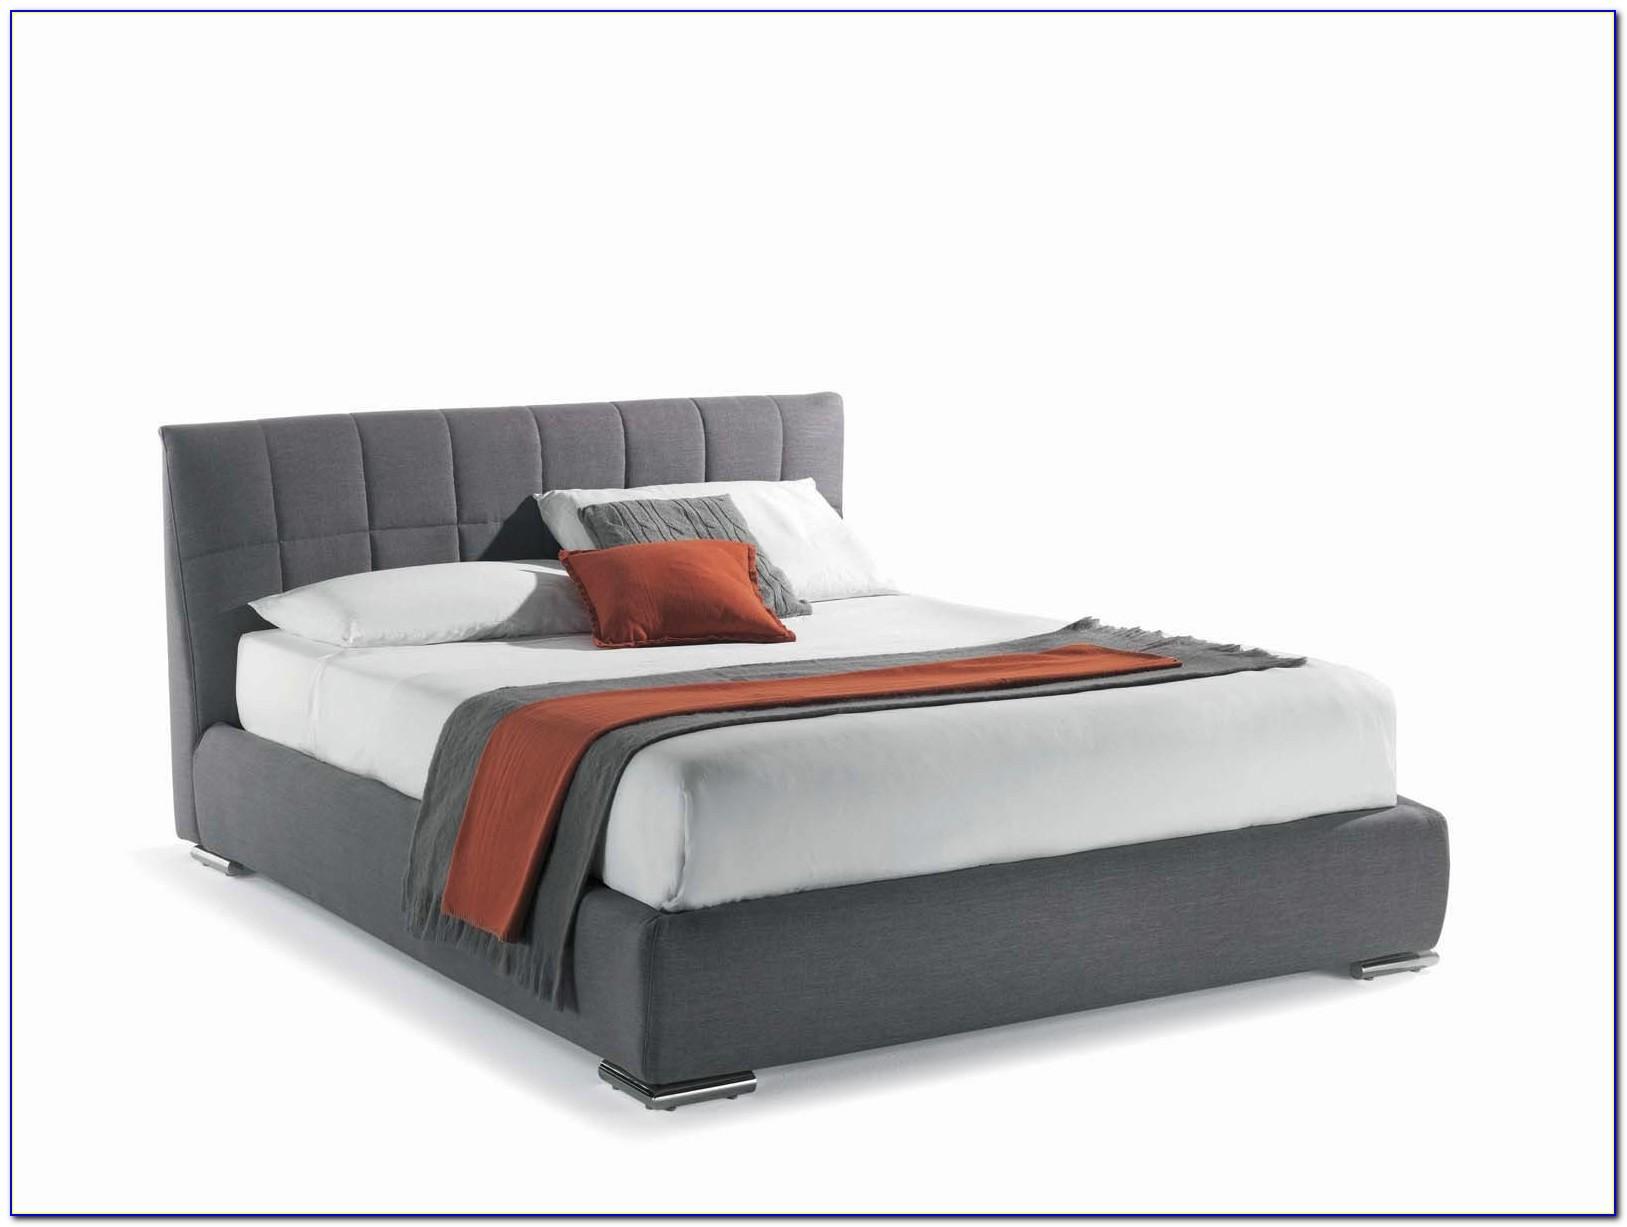 Bed Frame No Headboard Uk